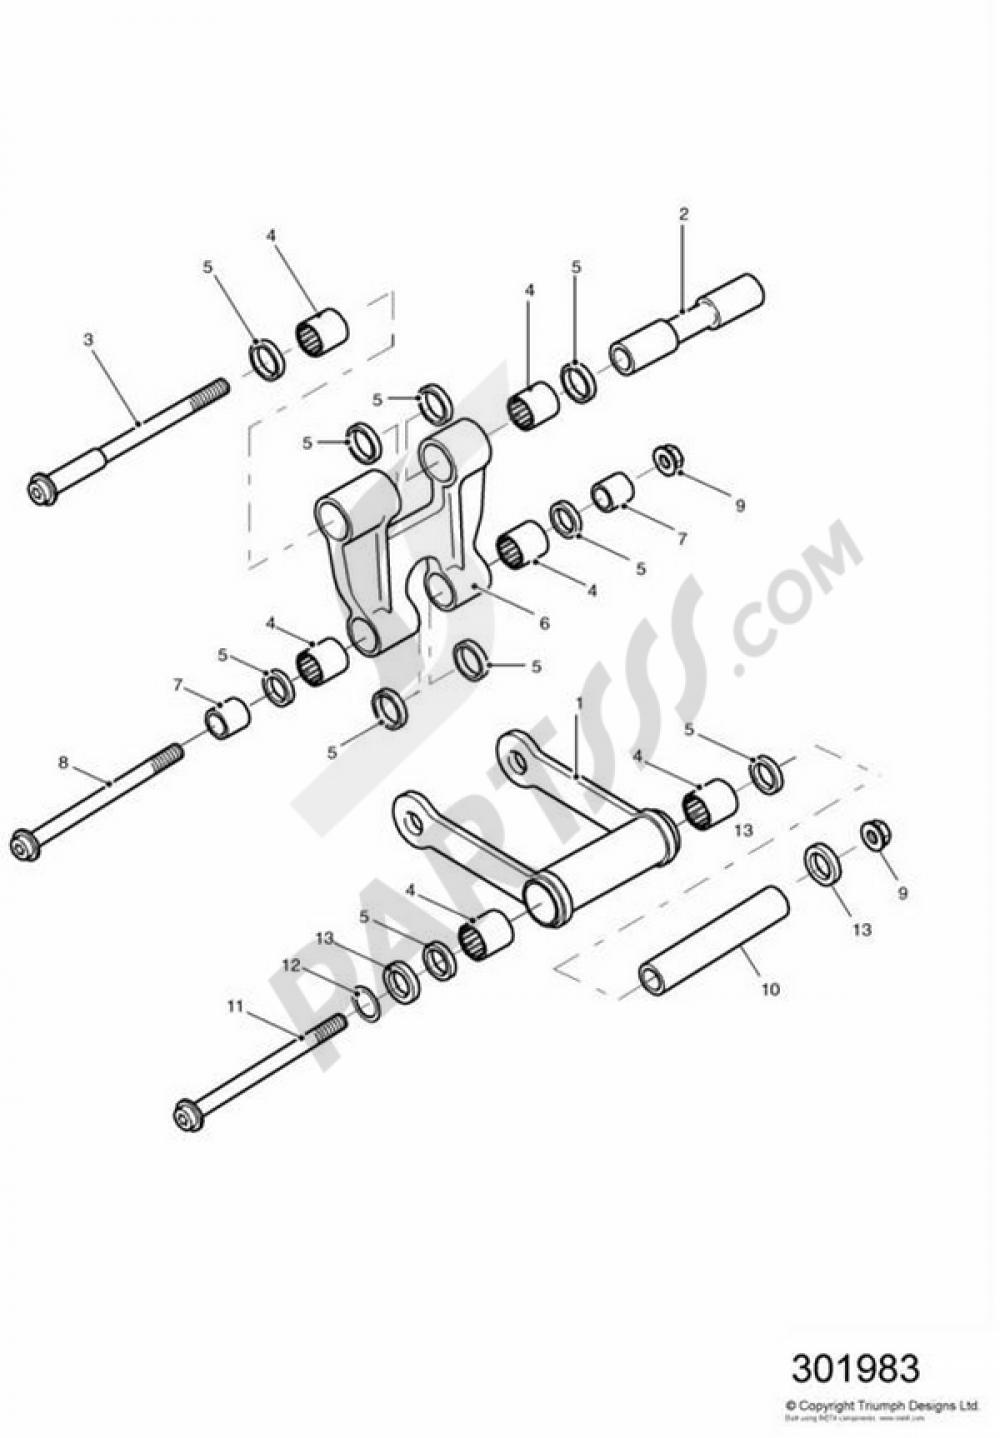 ktm linkage swing arm schematic